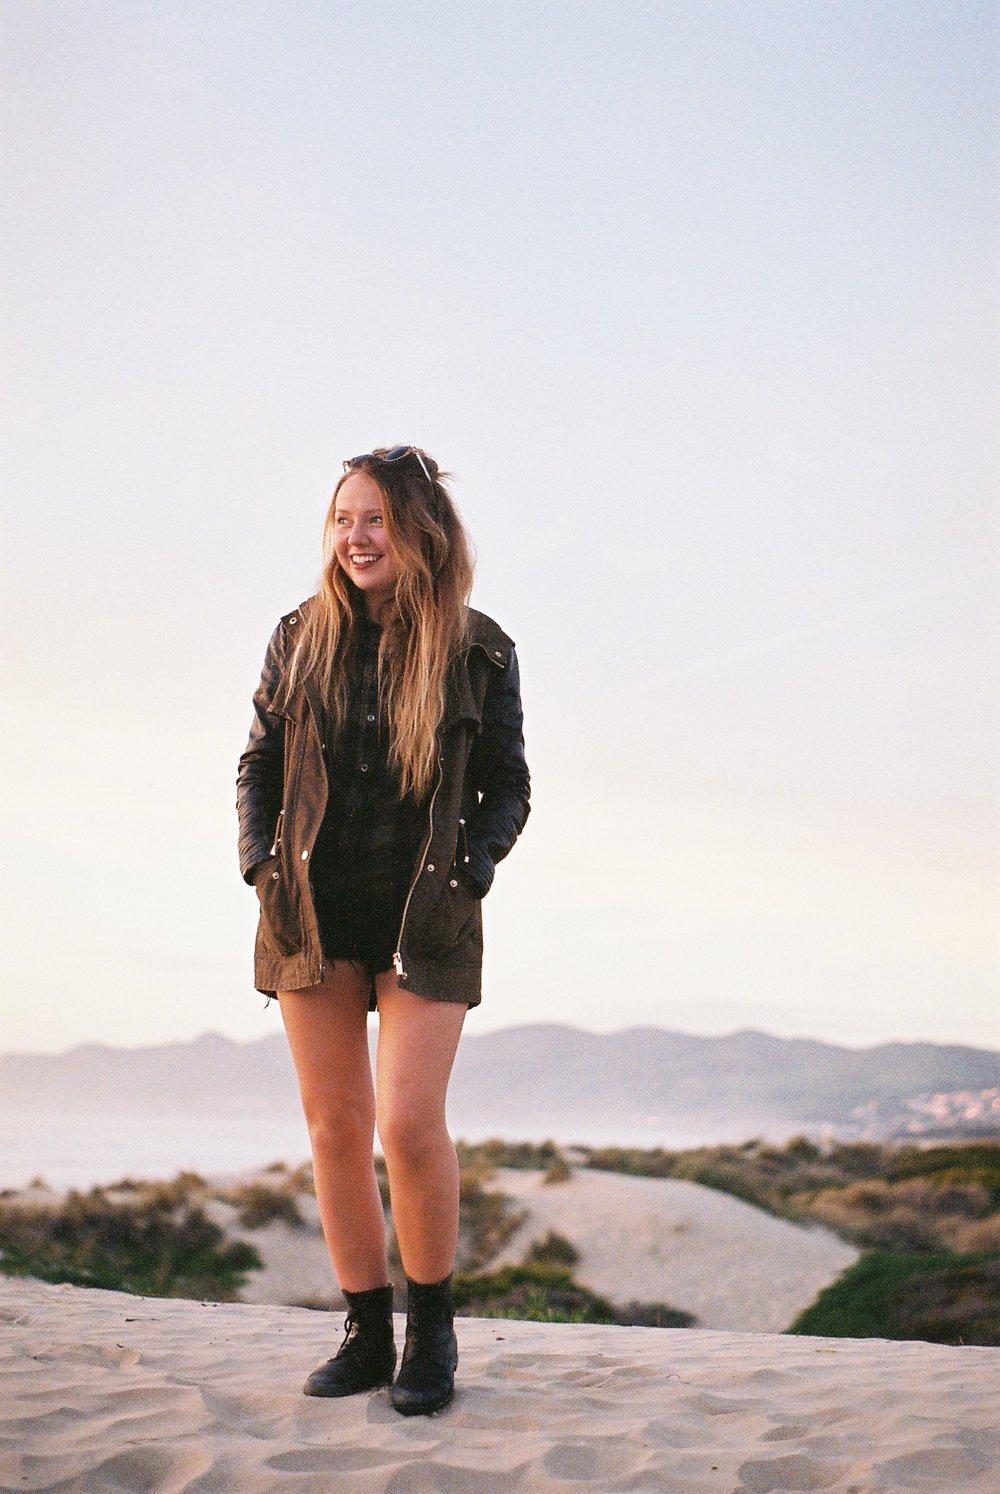 Izzy Pismo Beach California Analogue Travel Photographer